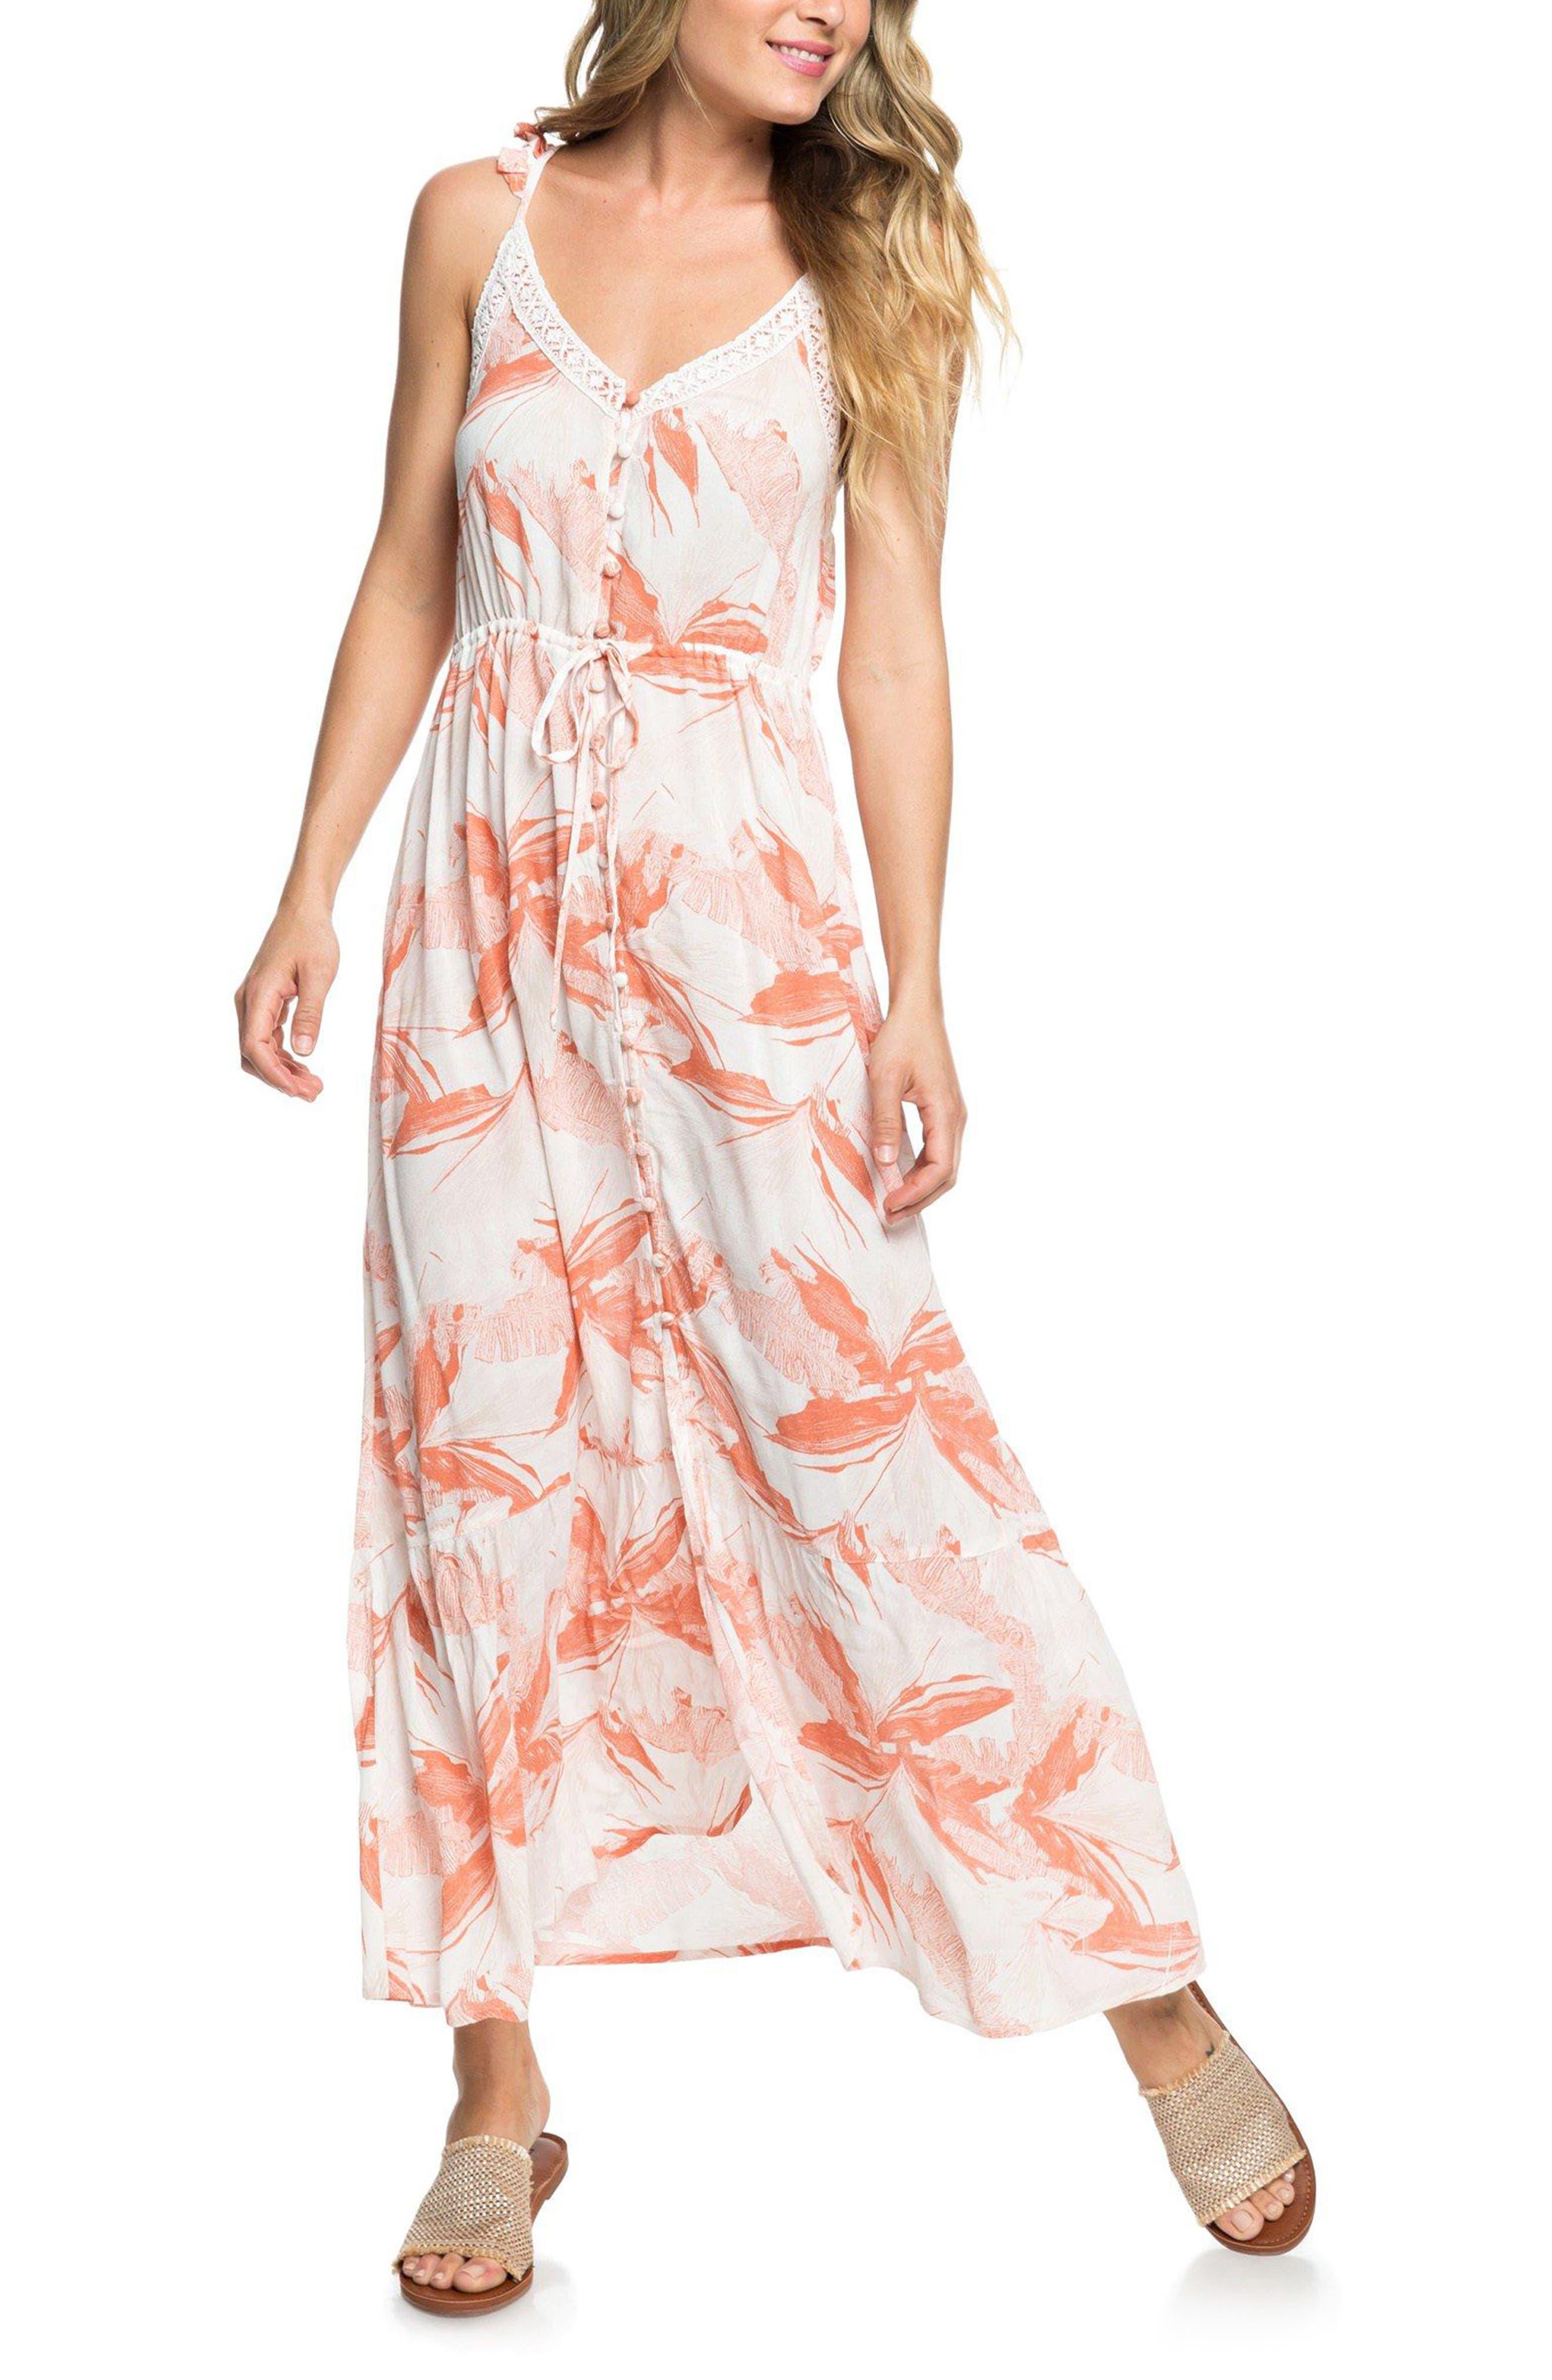 Roxy Hot Summer Lands Print Maxi Dress, Ivory